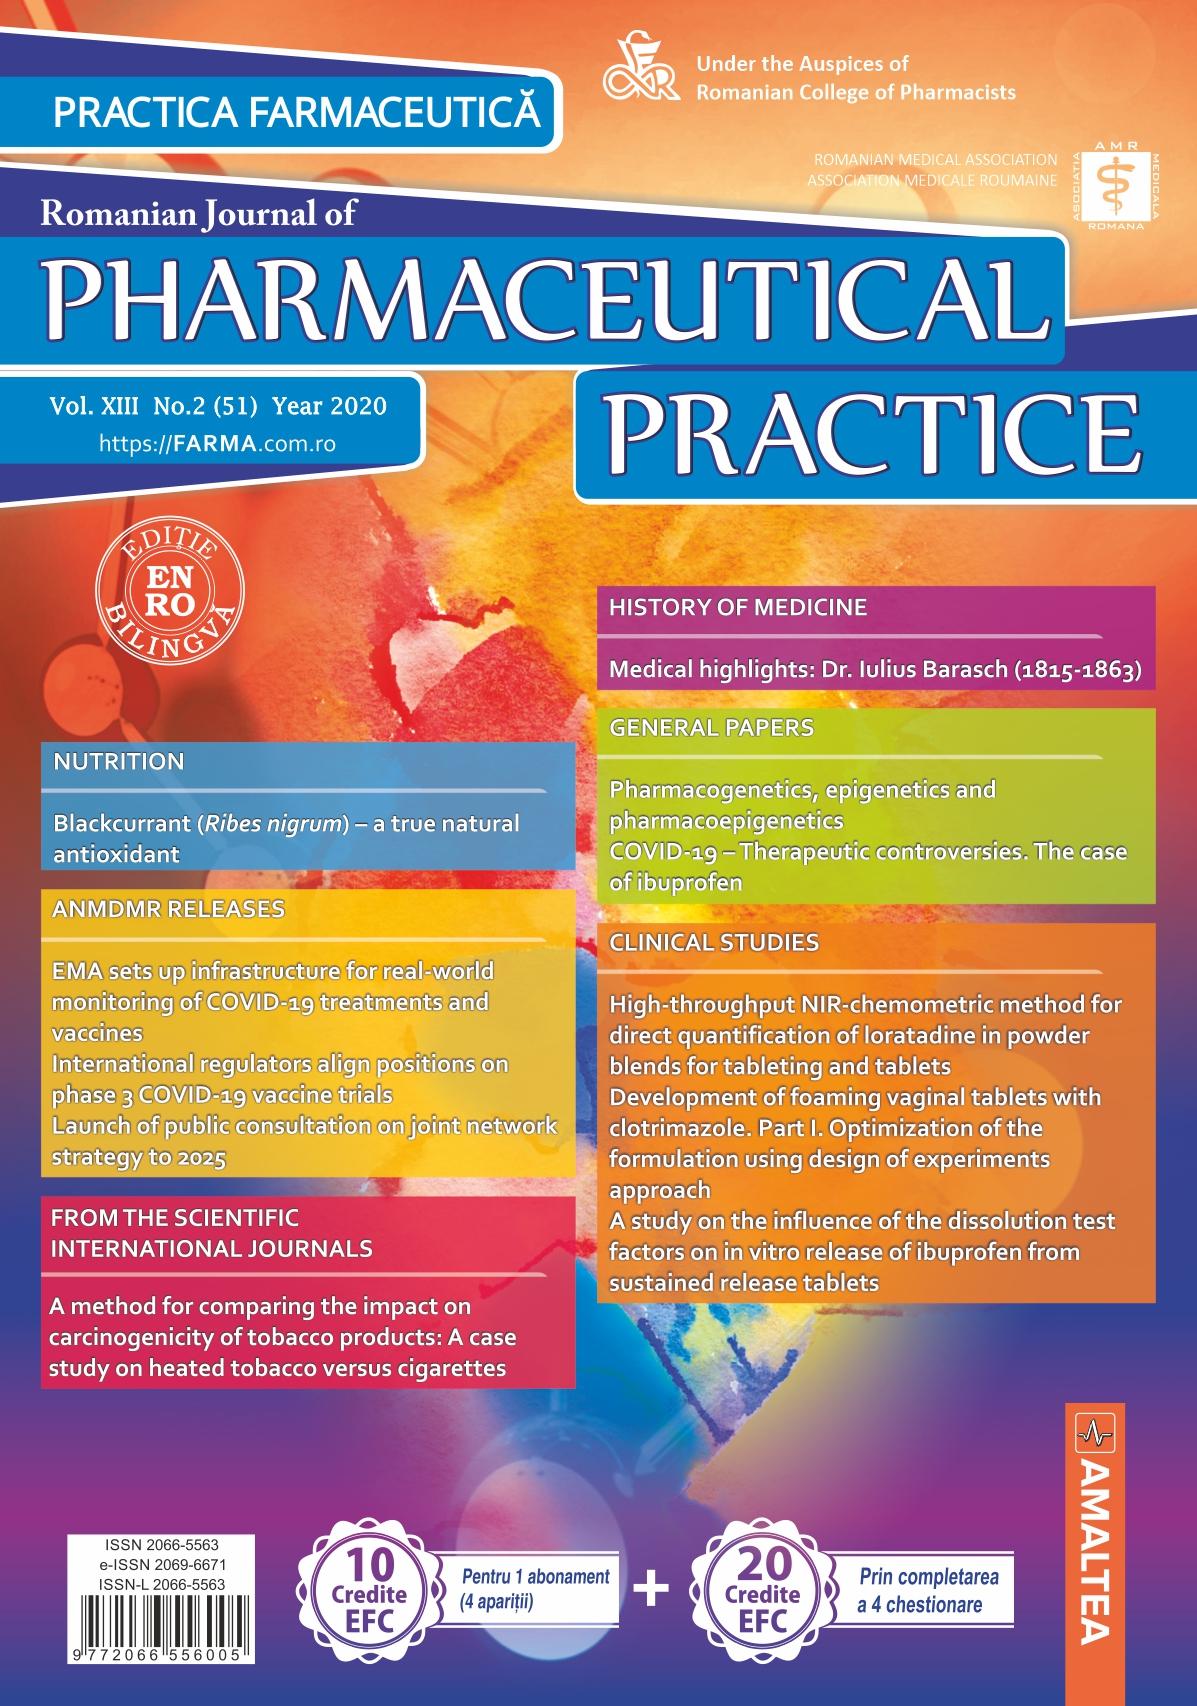 Romanian Journal of Pharmaceutical Practice - Practica Farmaceutica, Vol. XIII, No. 2 (51), 2020